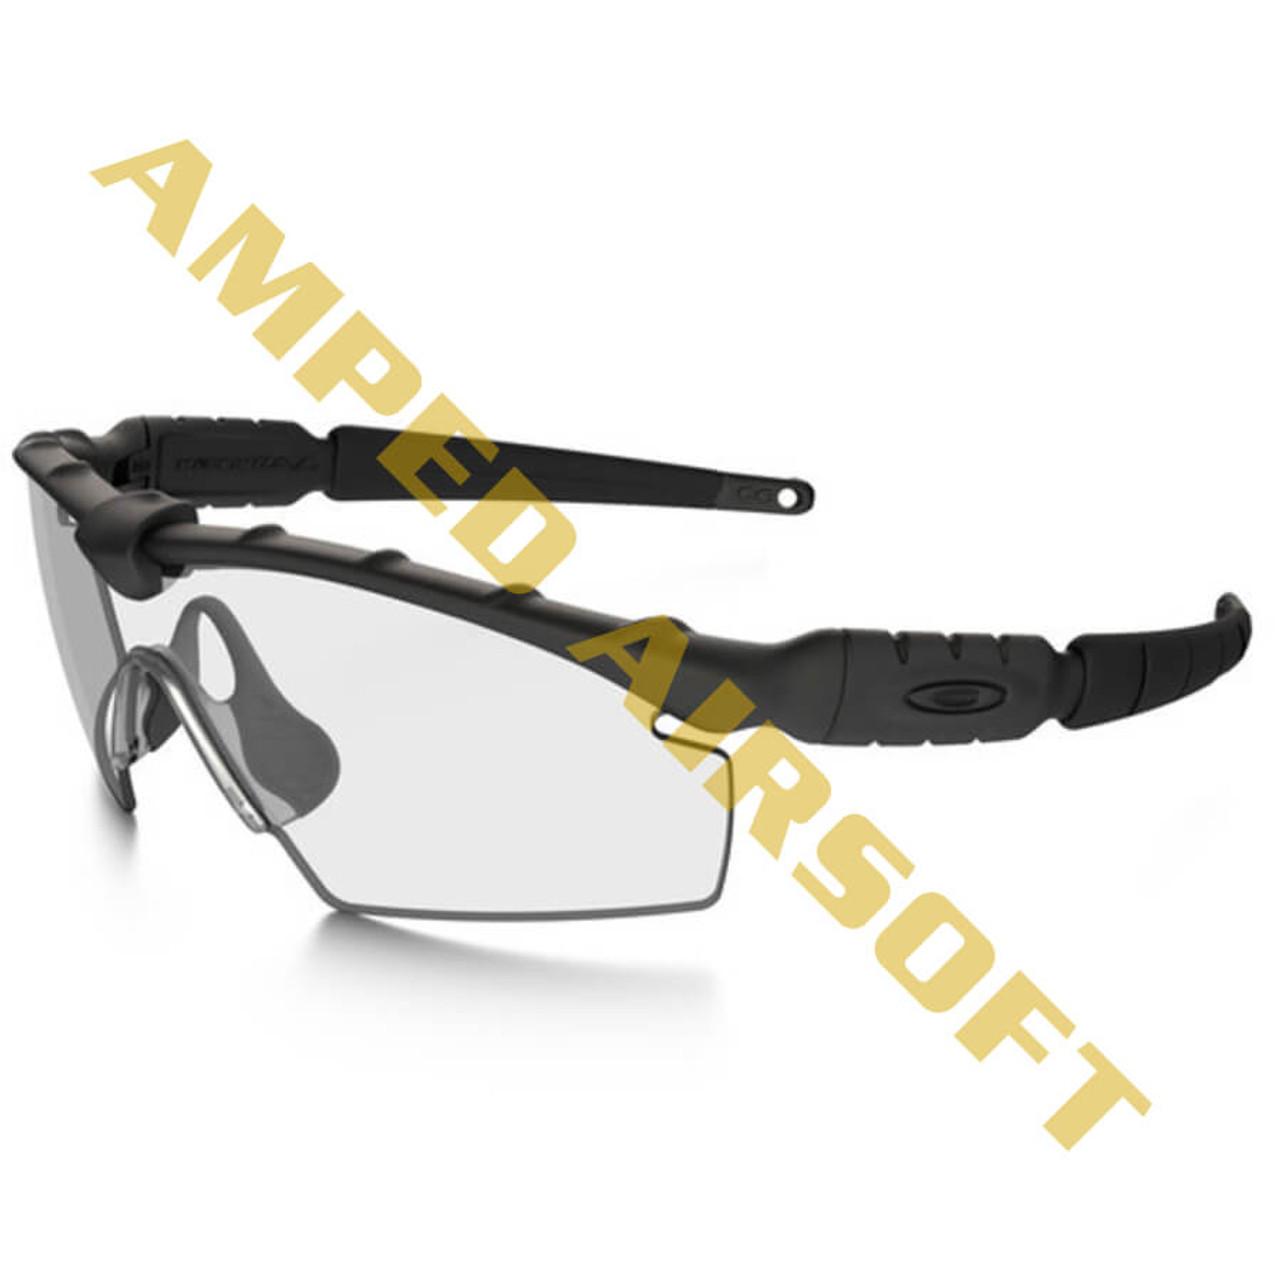 6ab815d0b6 Oakley M Frame 2.0 Strike Ballistic Sunglasses